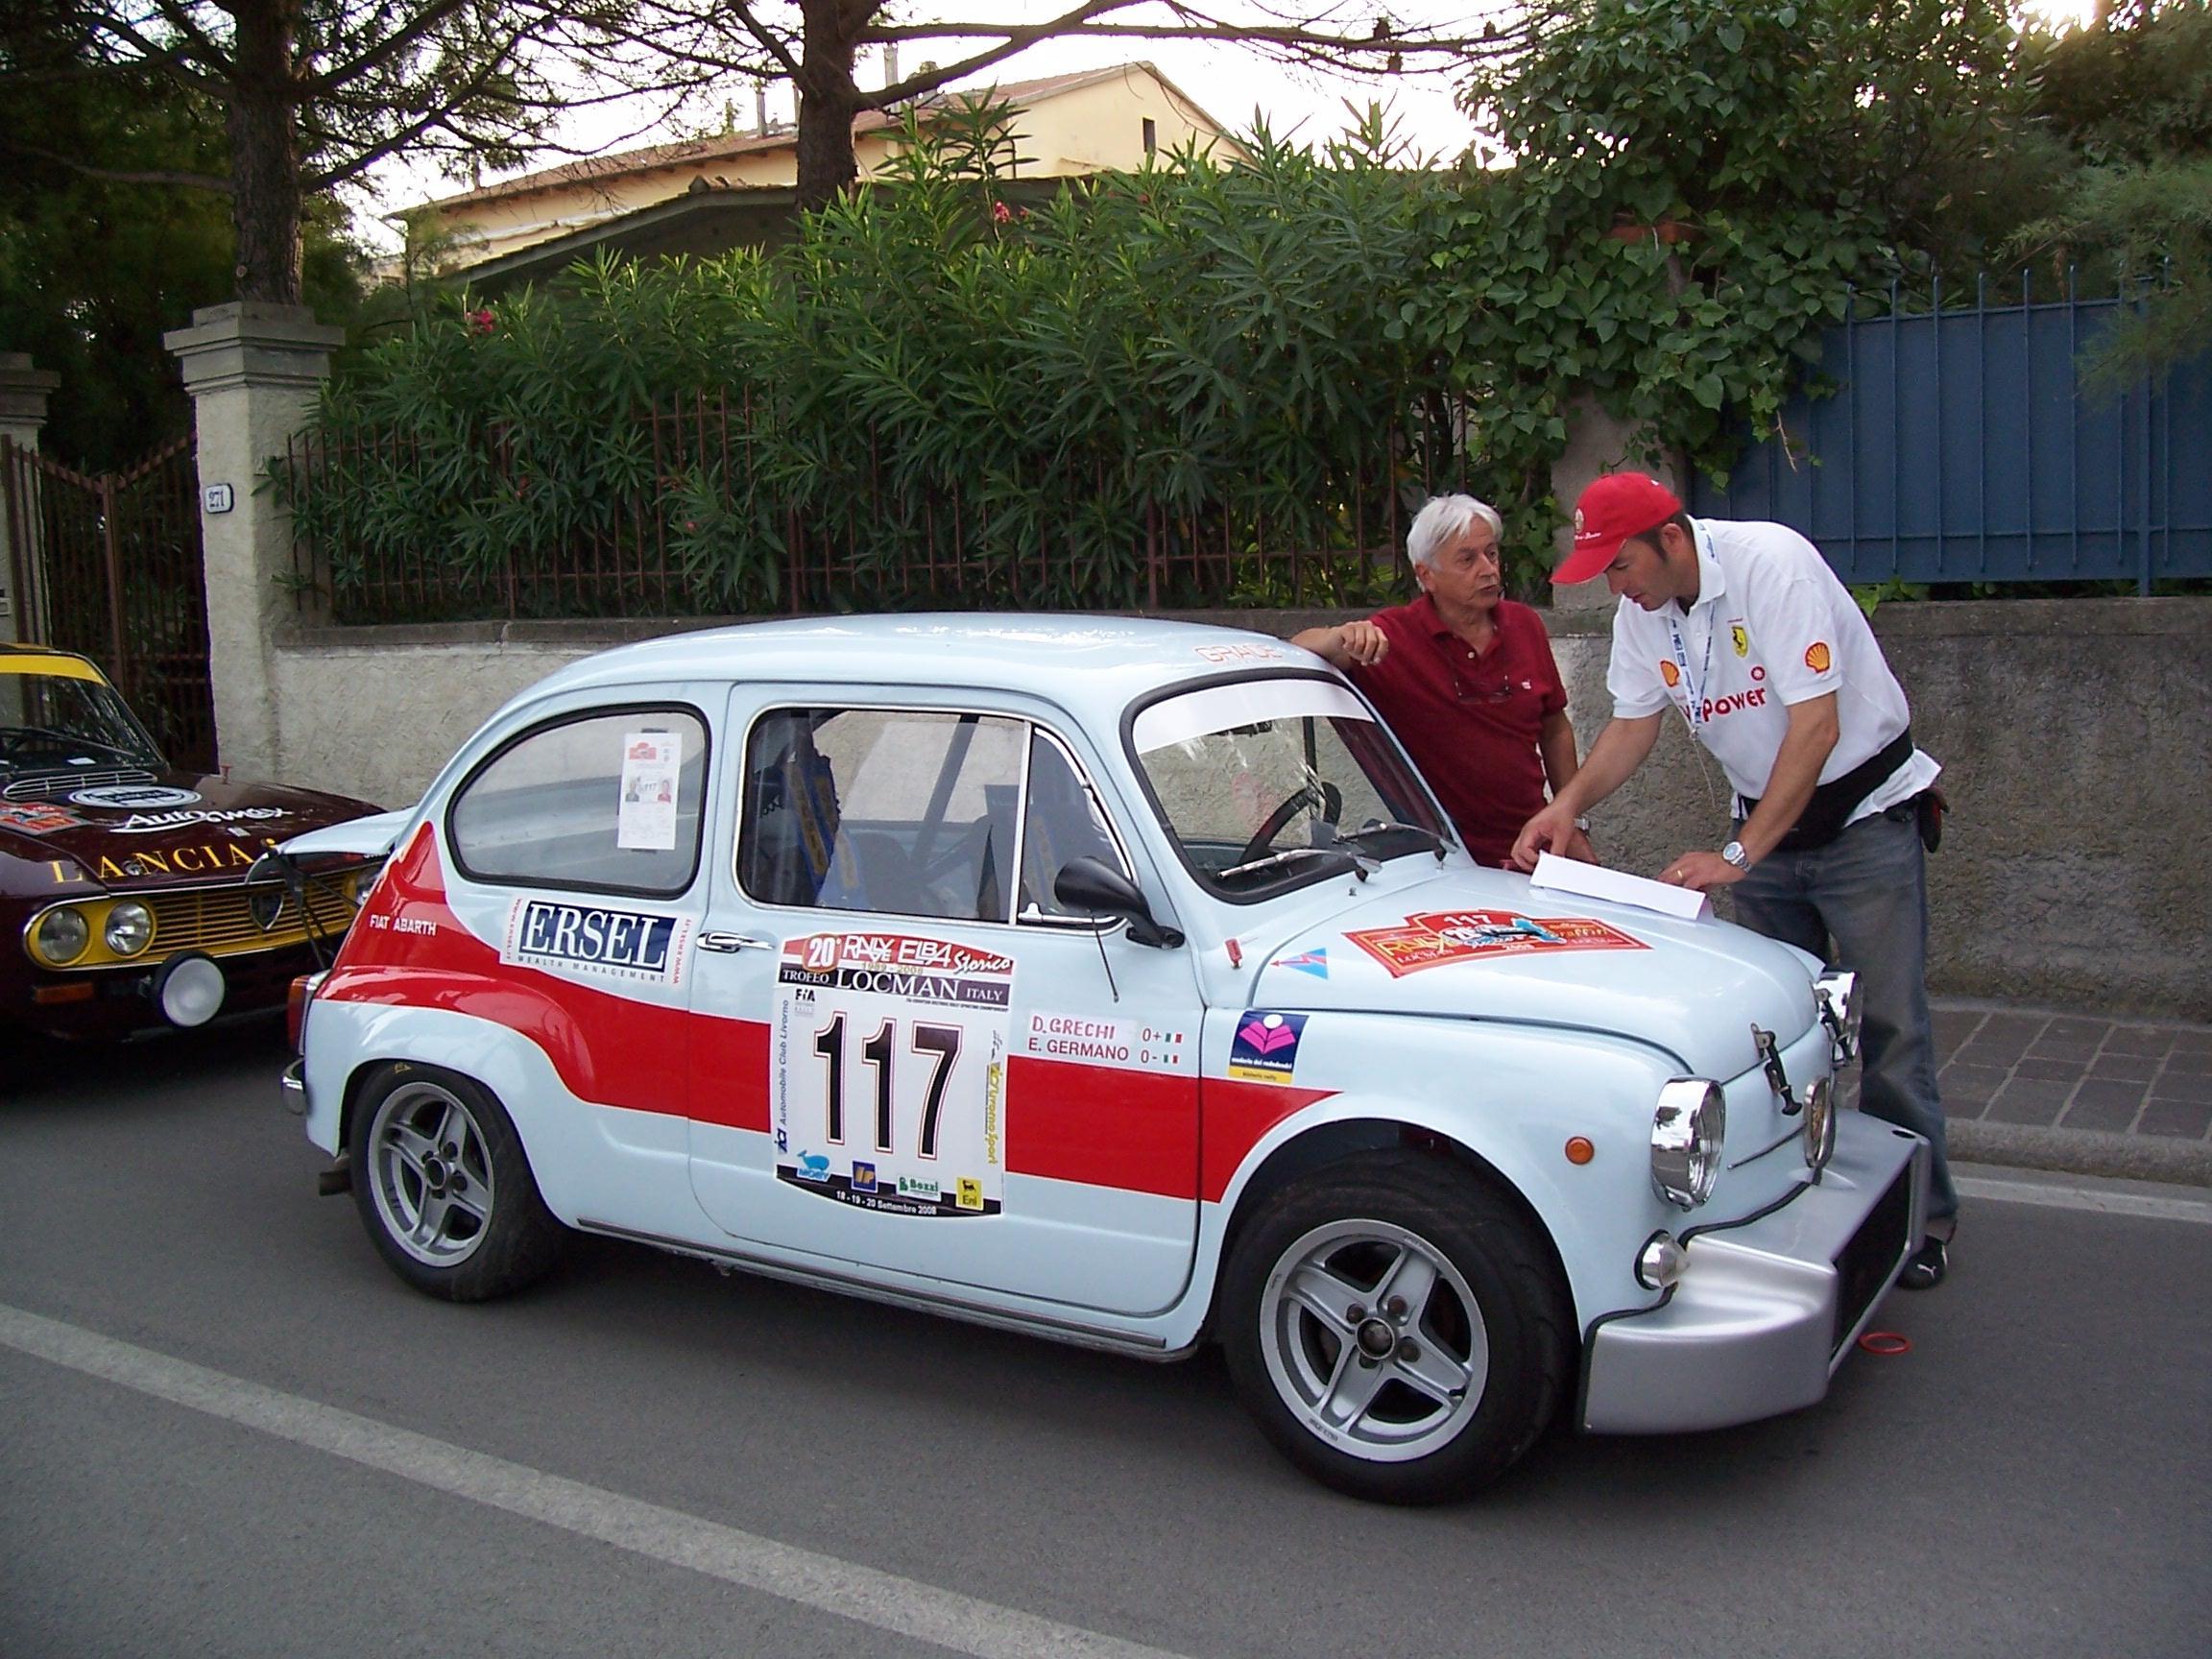 Pagina 2 Fotografie Rallye Elba Storico 2008 18 19 20